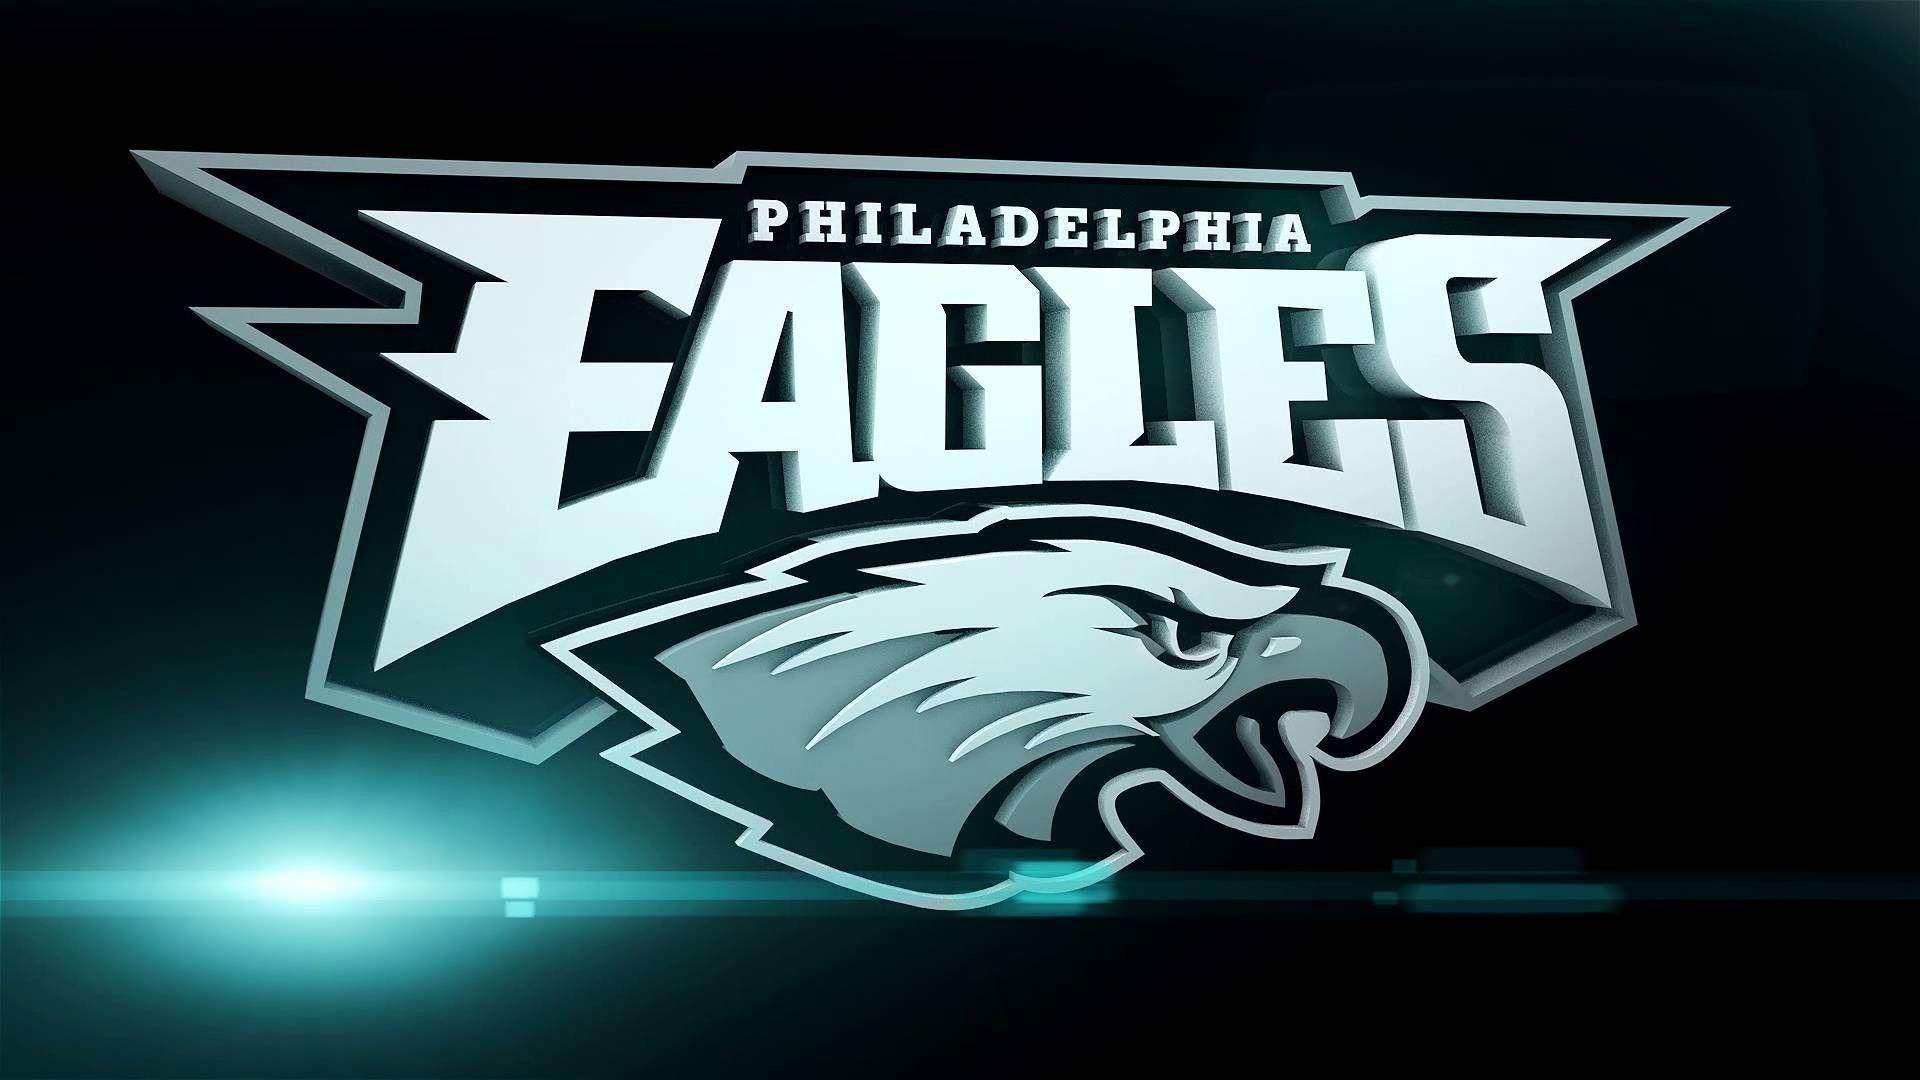 Res: 1920x1080, Free Philadelphia Eagles Desktop Wallpaper 1024×768 Free Philadelphia Eagles  Wallpapers   Adorable Wallpapers